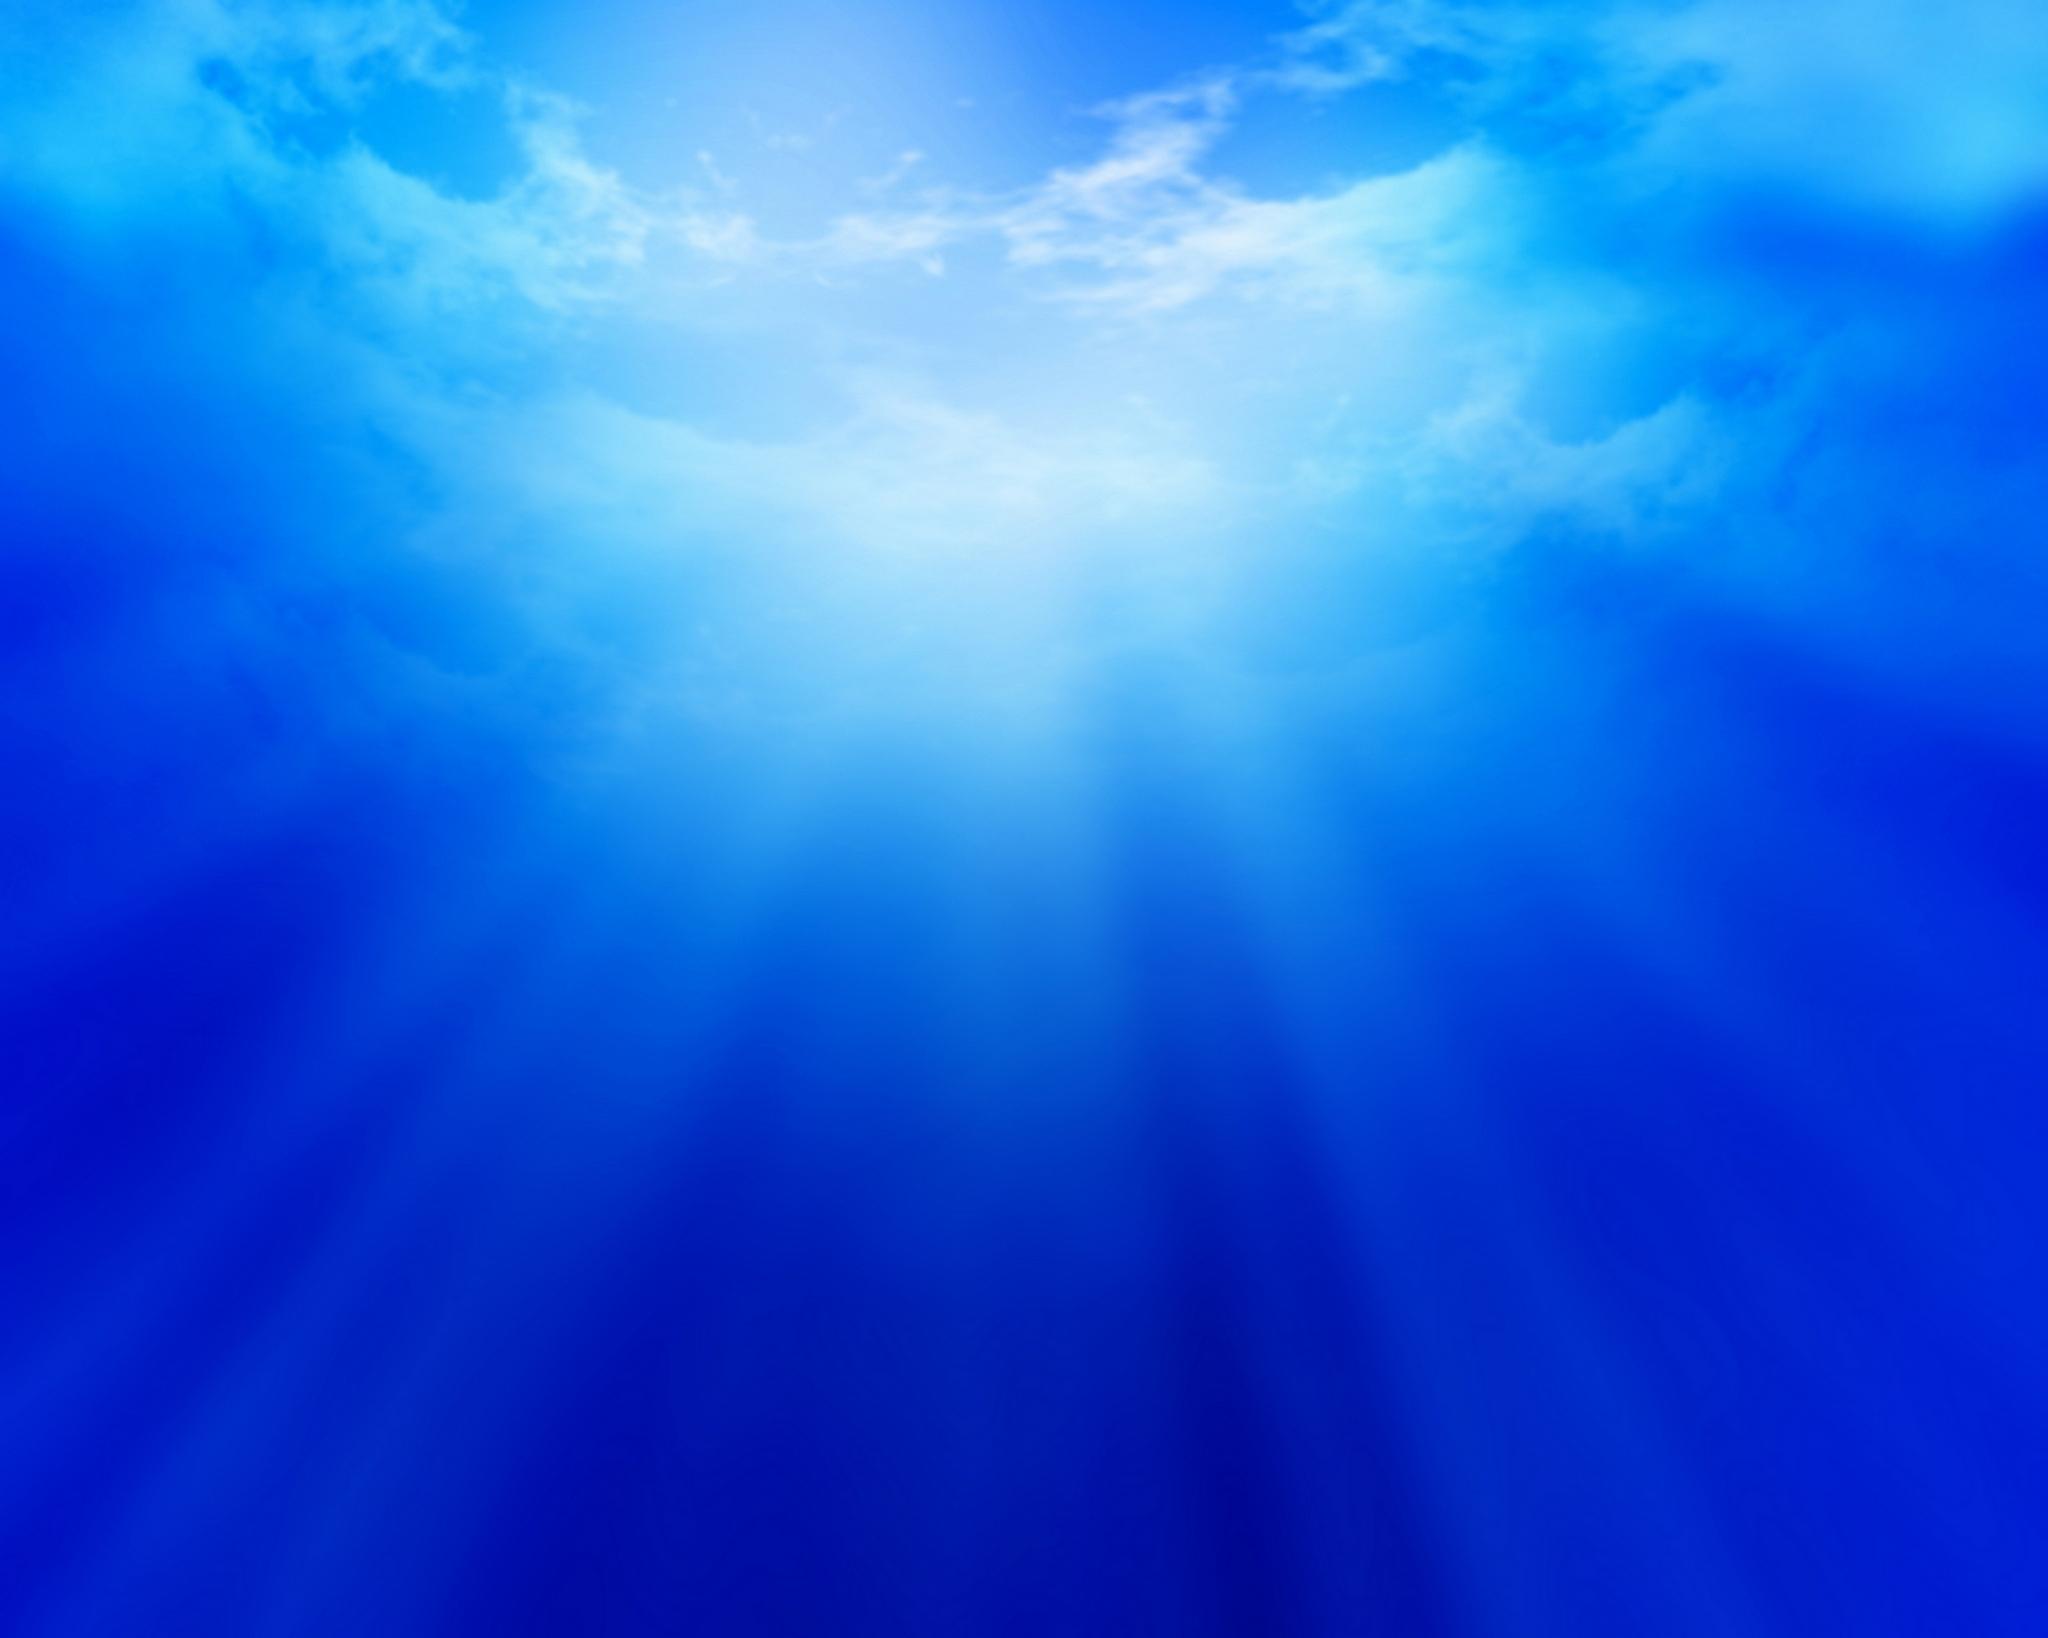 Blue Blue digital sky 2048x1638